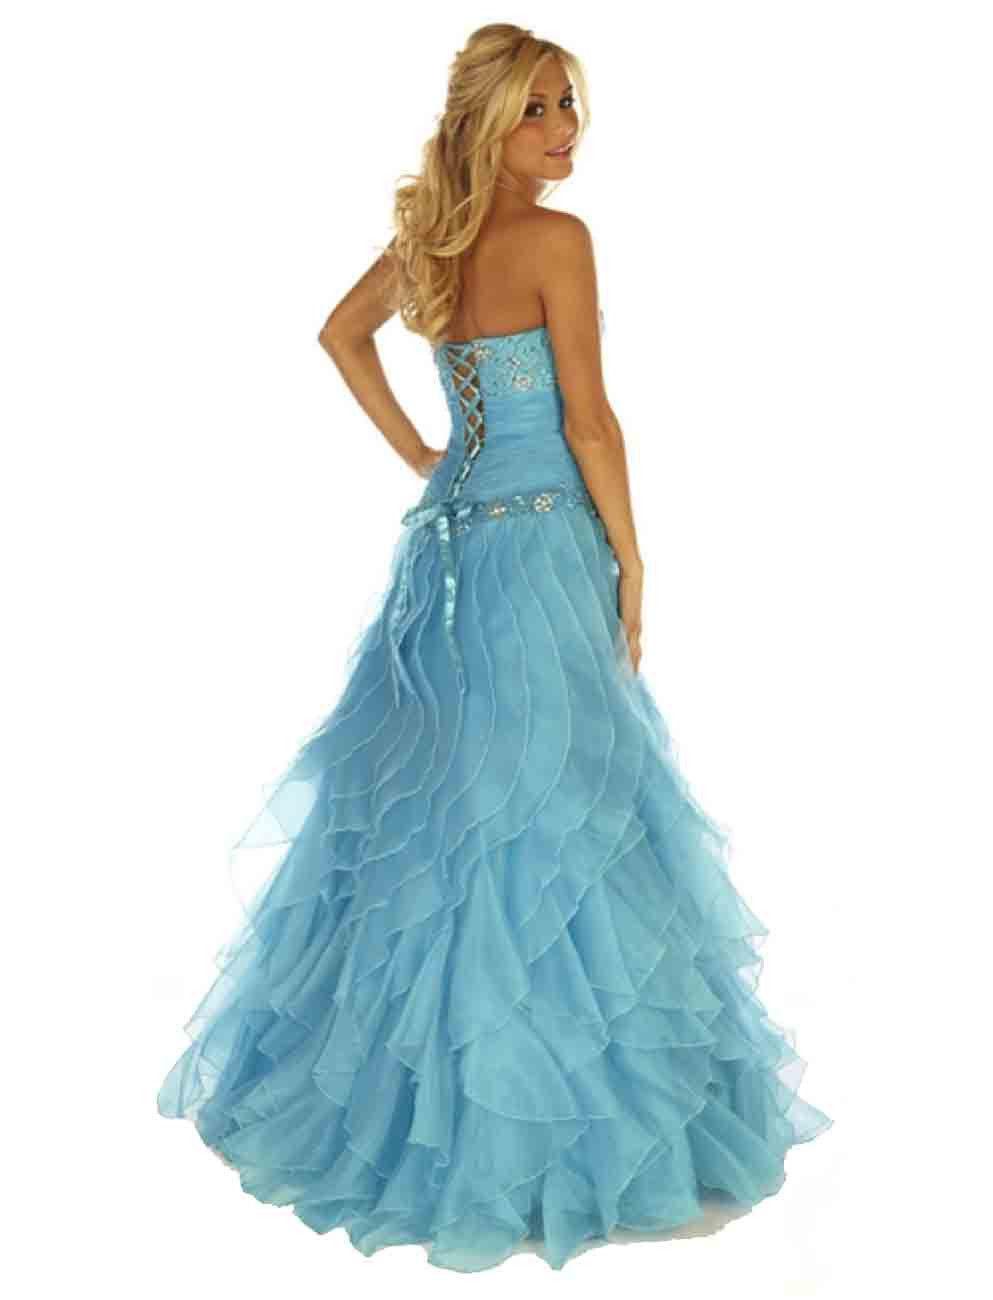 Image 1 of Sexy Strapless Corset Aqua Cinderella Mermaid Prom Evening Gown Joli 9538 12